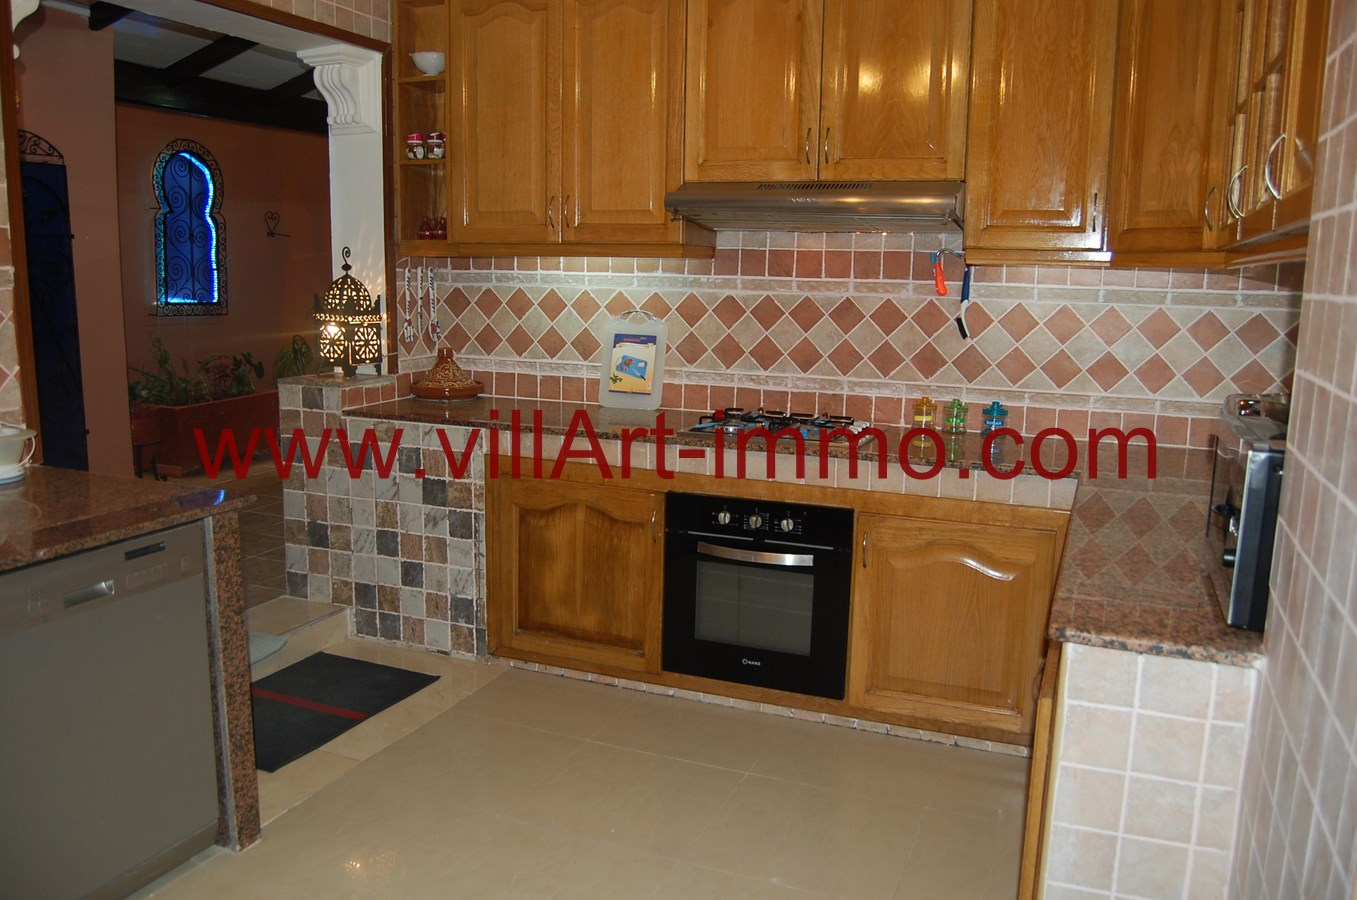 6-location-appartement-meuble-iberia-tanger-cuisine-l895-villart-immo